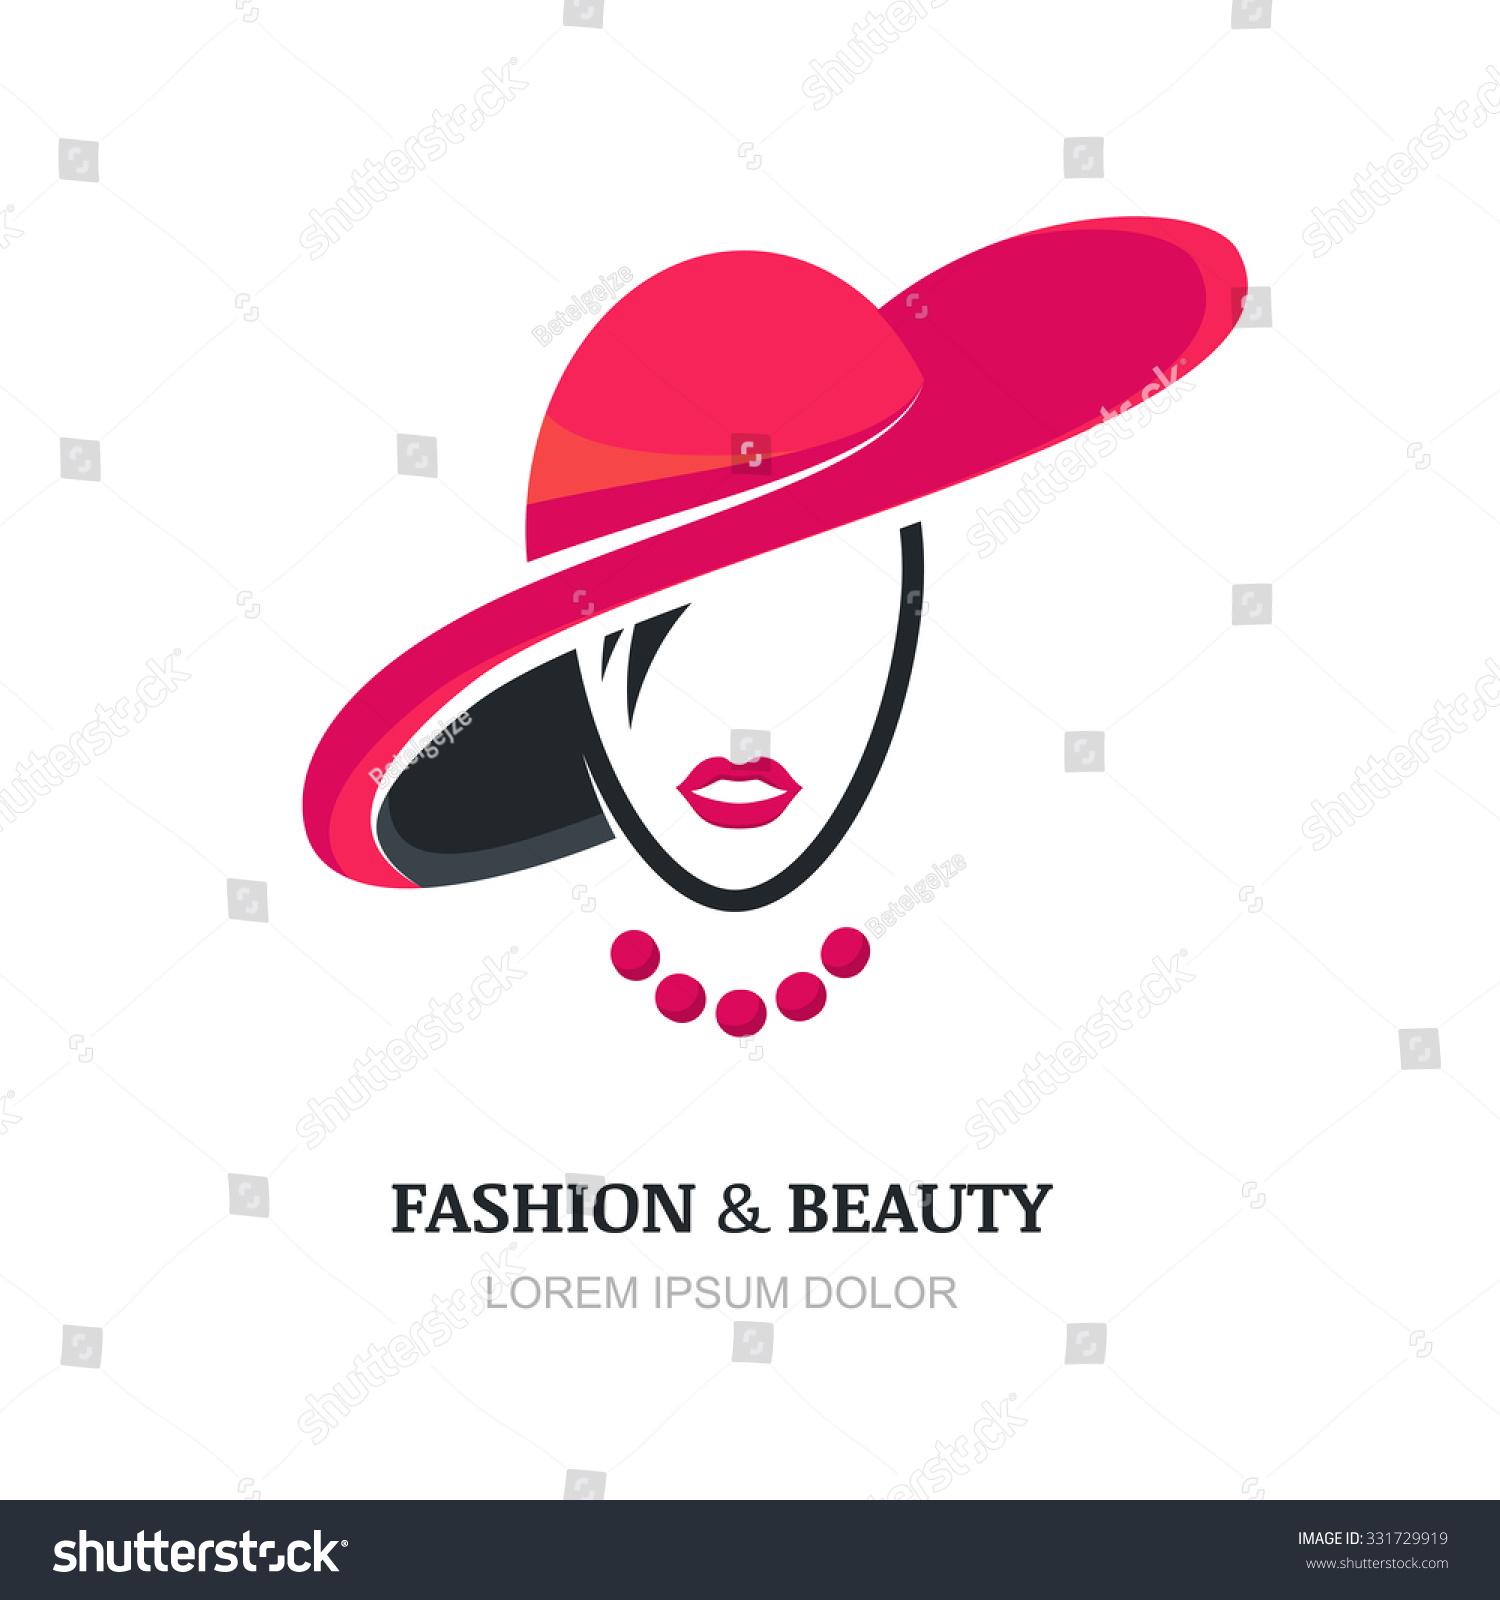 Fashion Logo Free Vector Art  39357 Free Downloads